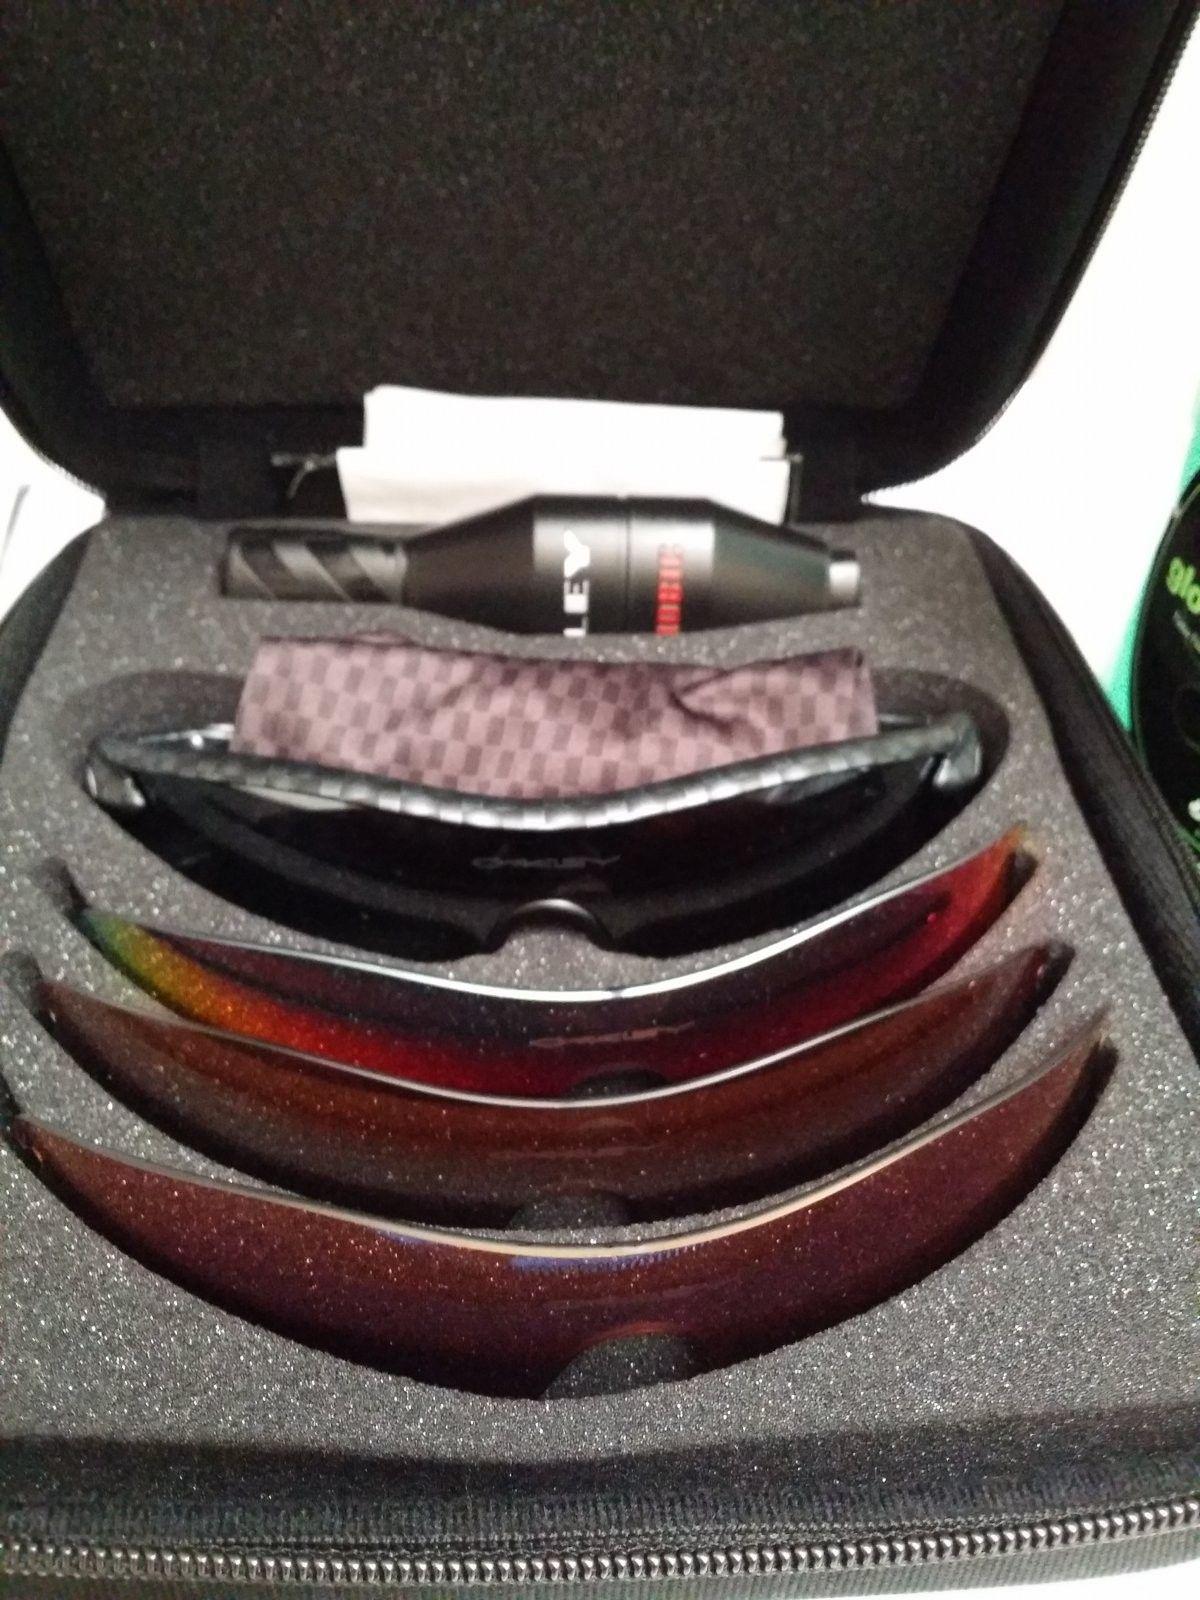 Matte Carbon Radarlock Array With 4 Lenses - 20140804_153709.jpg